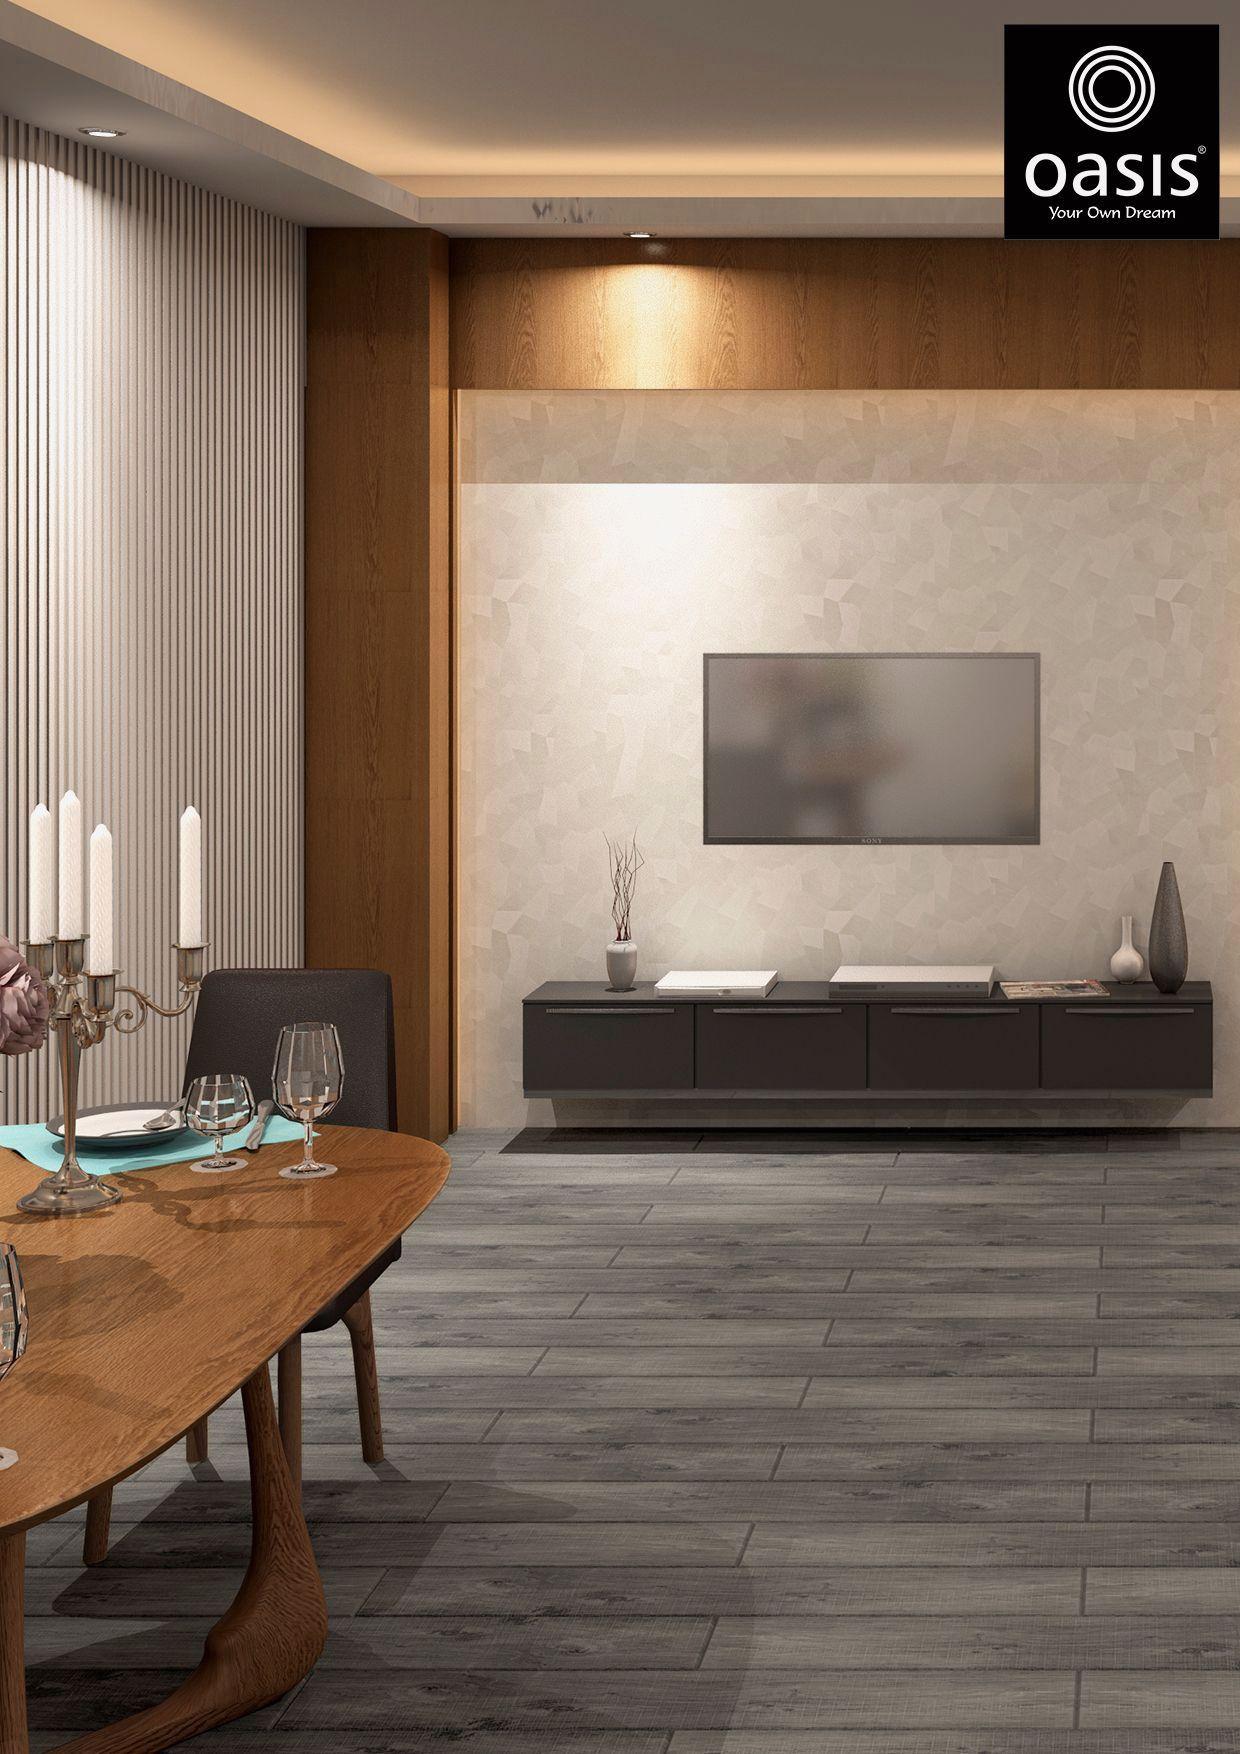 17 Latest Floor Tiles Design For Living Room In 2020 Living Room Tiles Tile Floor Living Room Living Room Designs India